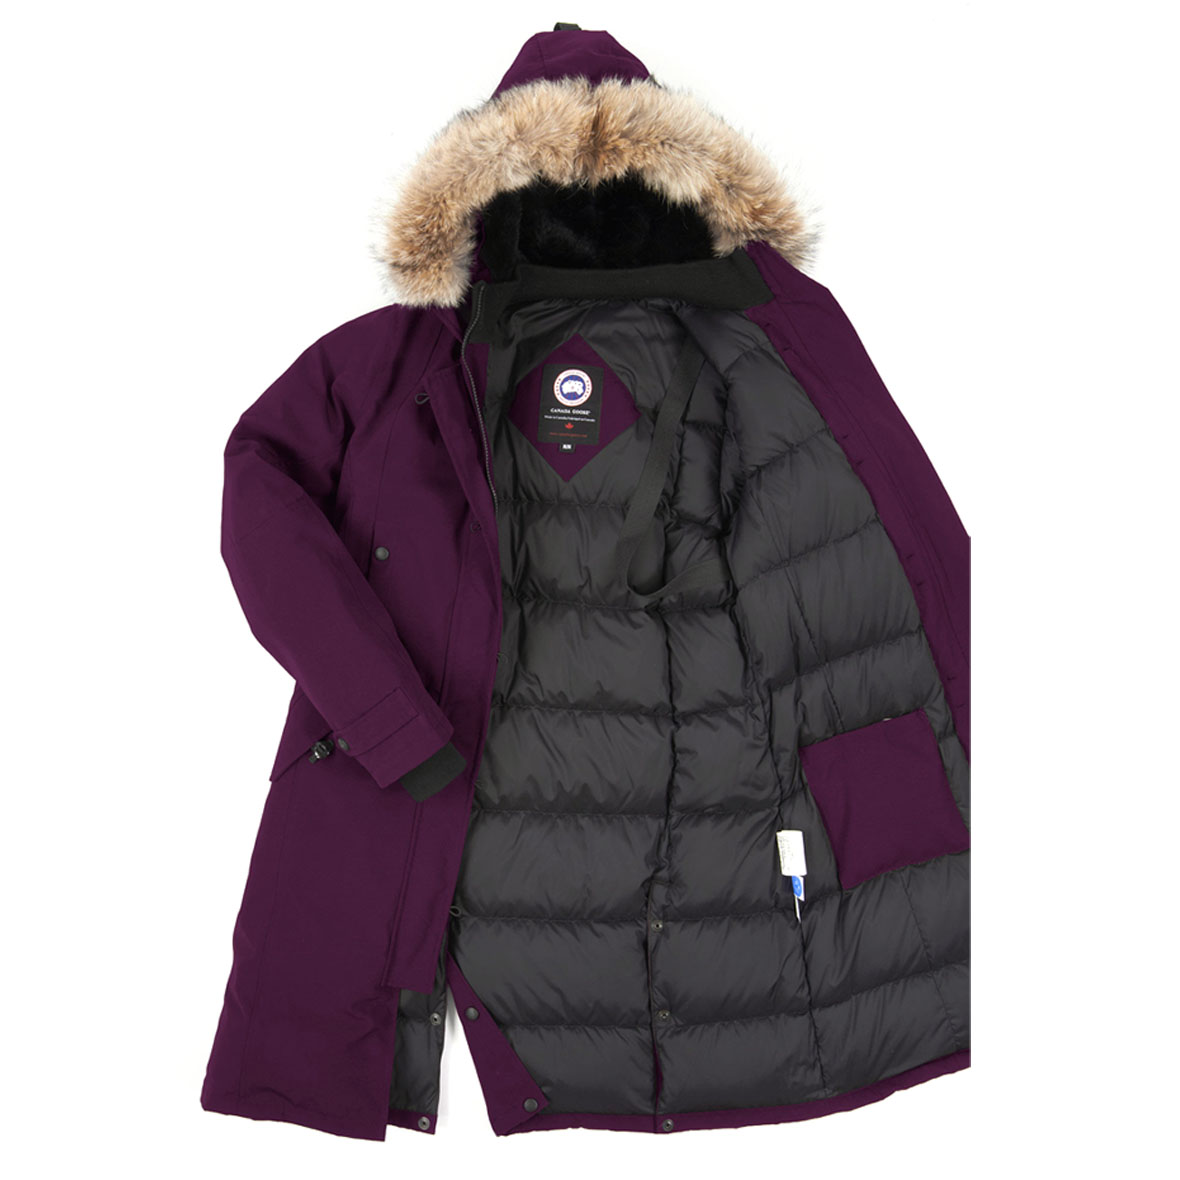 Canada Goose Womens | Canada Goose Jacket Clearance | Canada Goose Kensington Parka